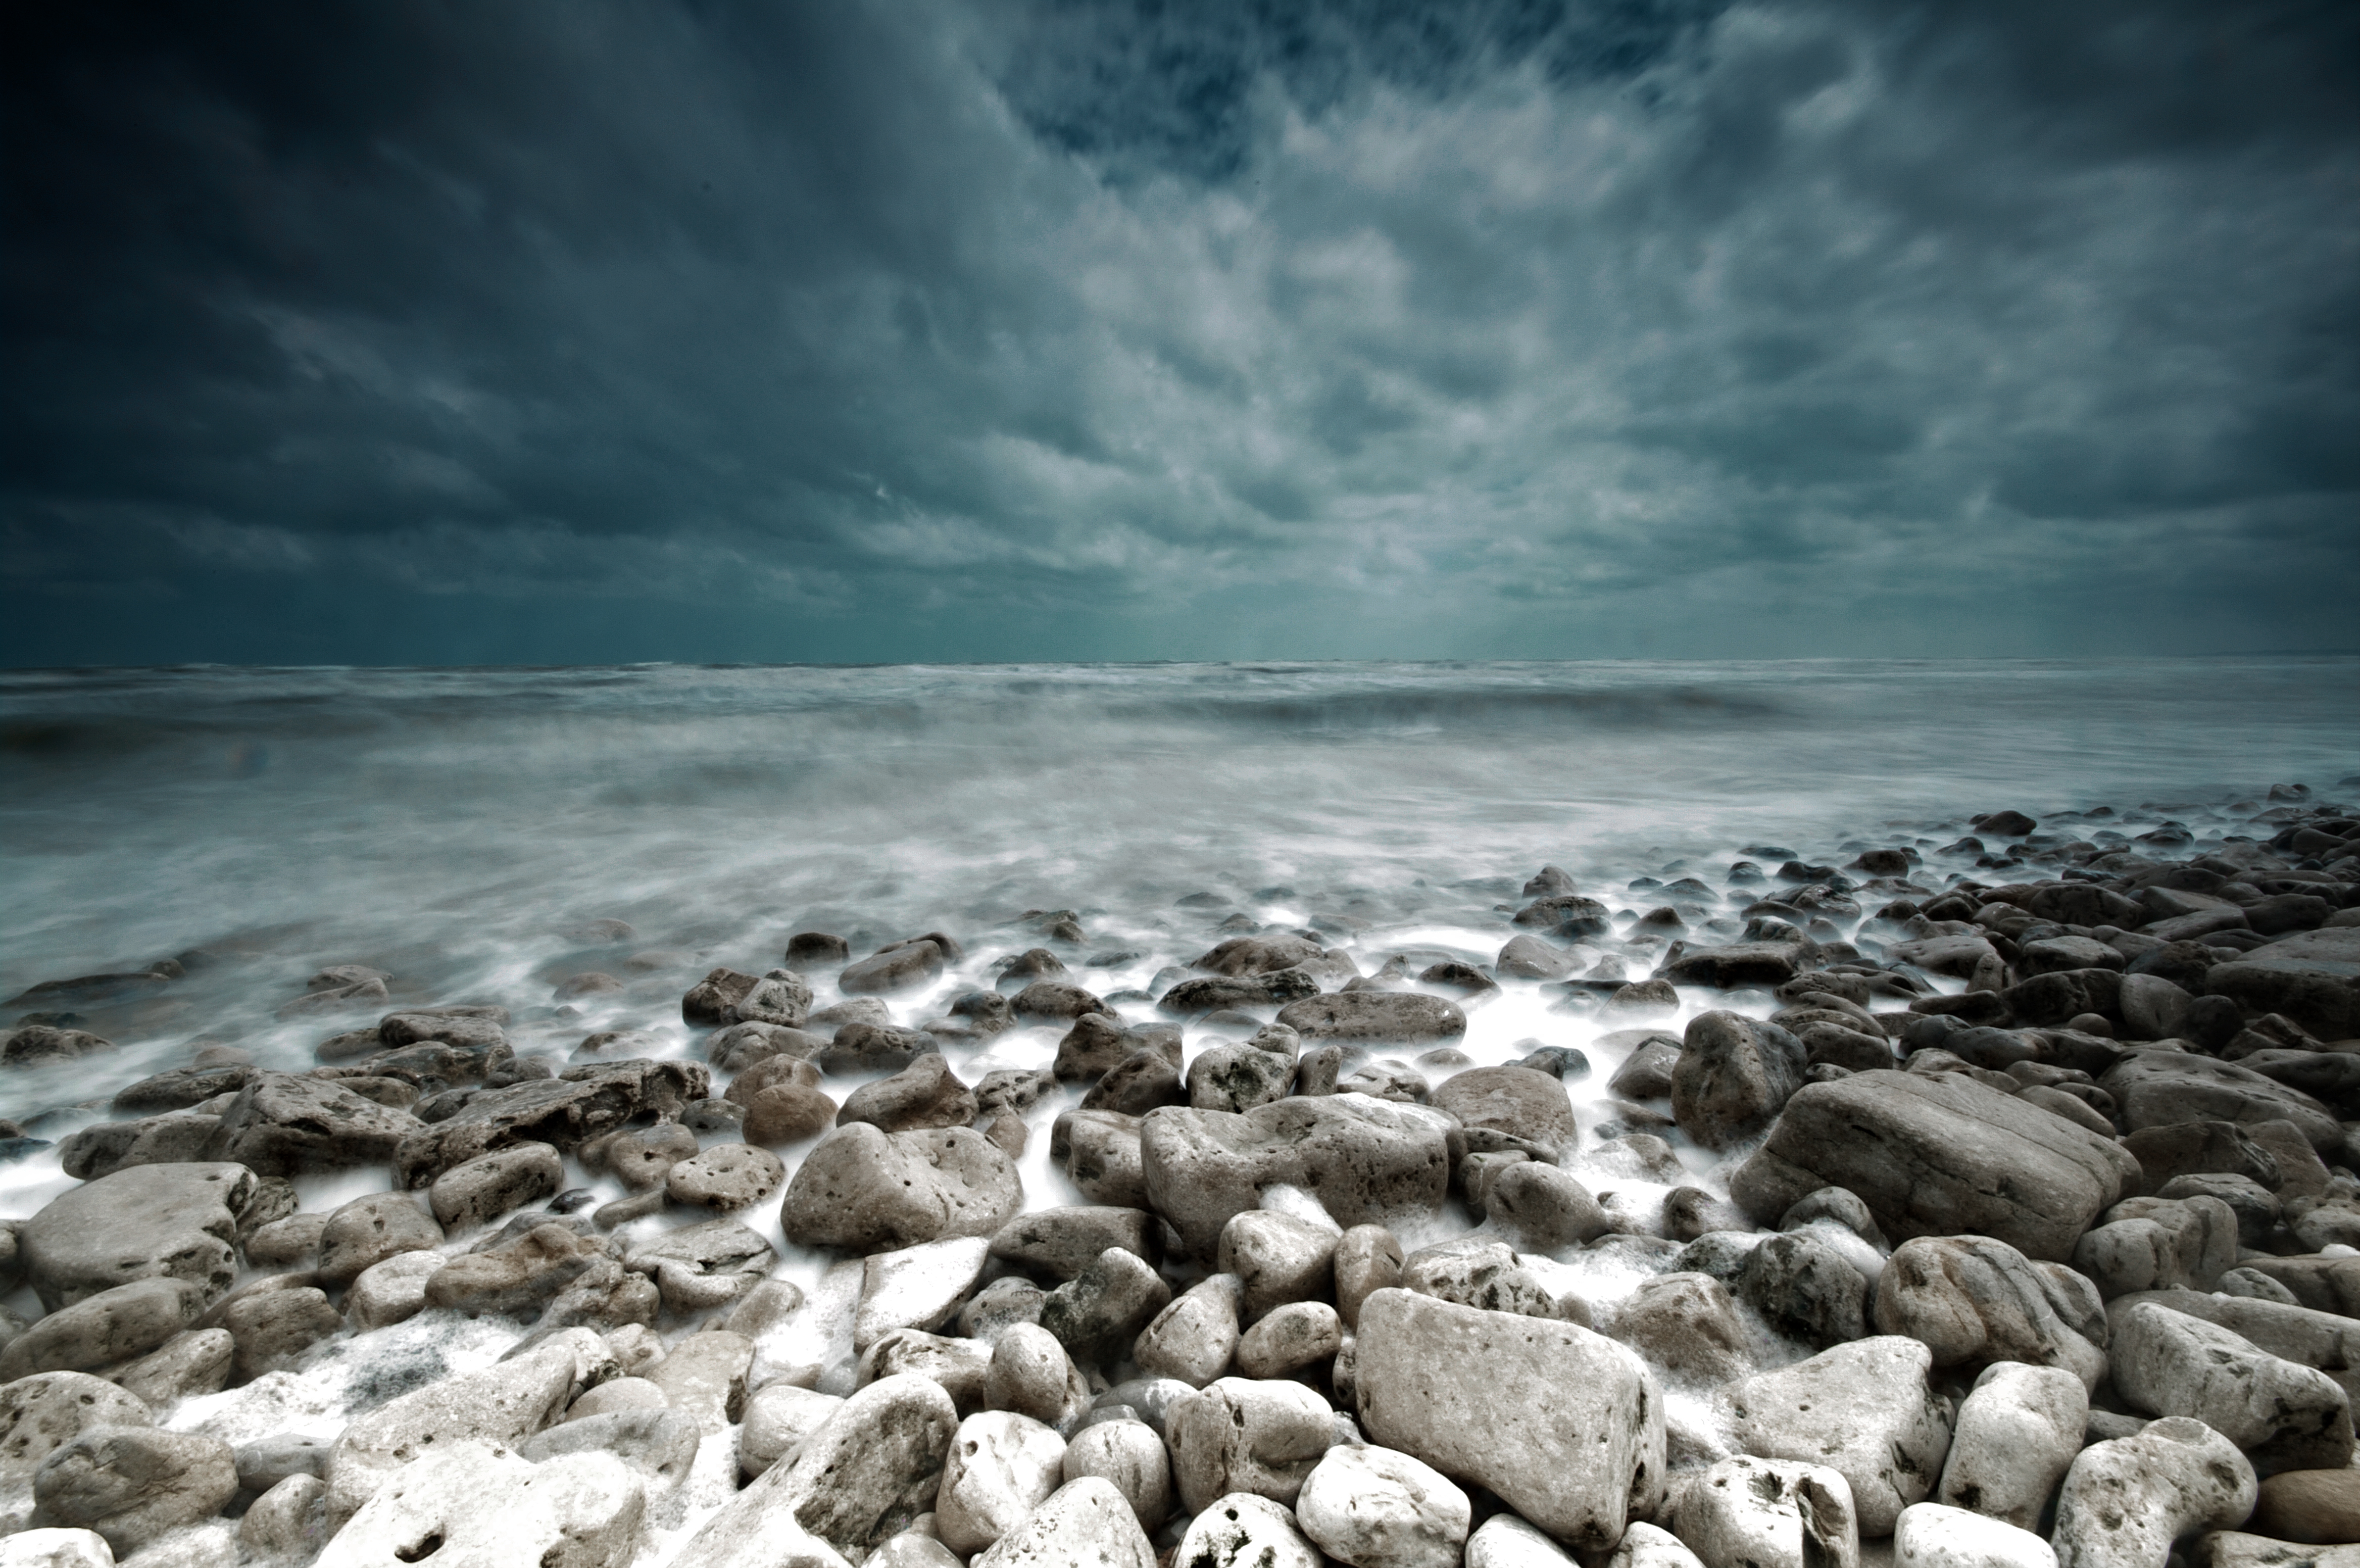 Пейзаж landscape камни море шторм буря